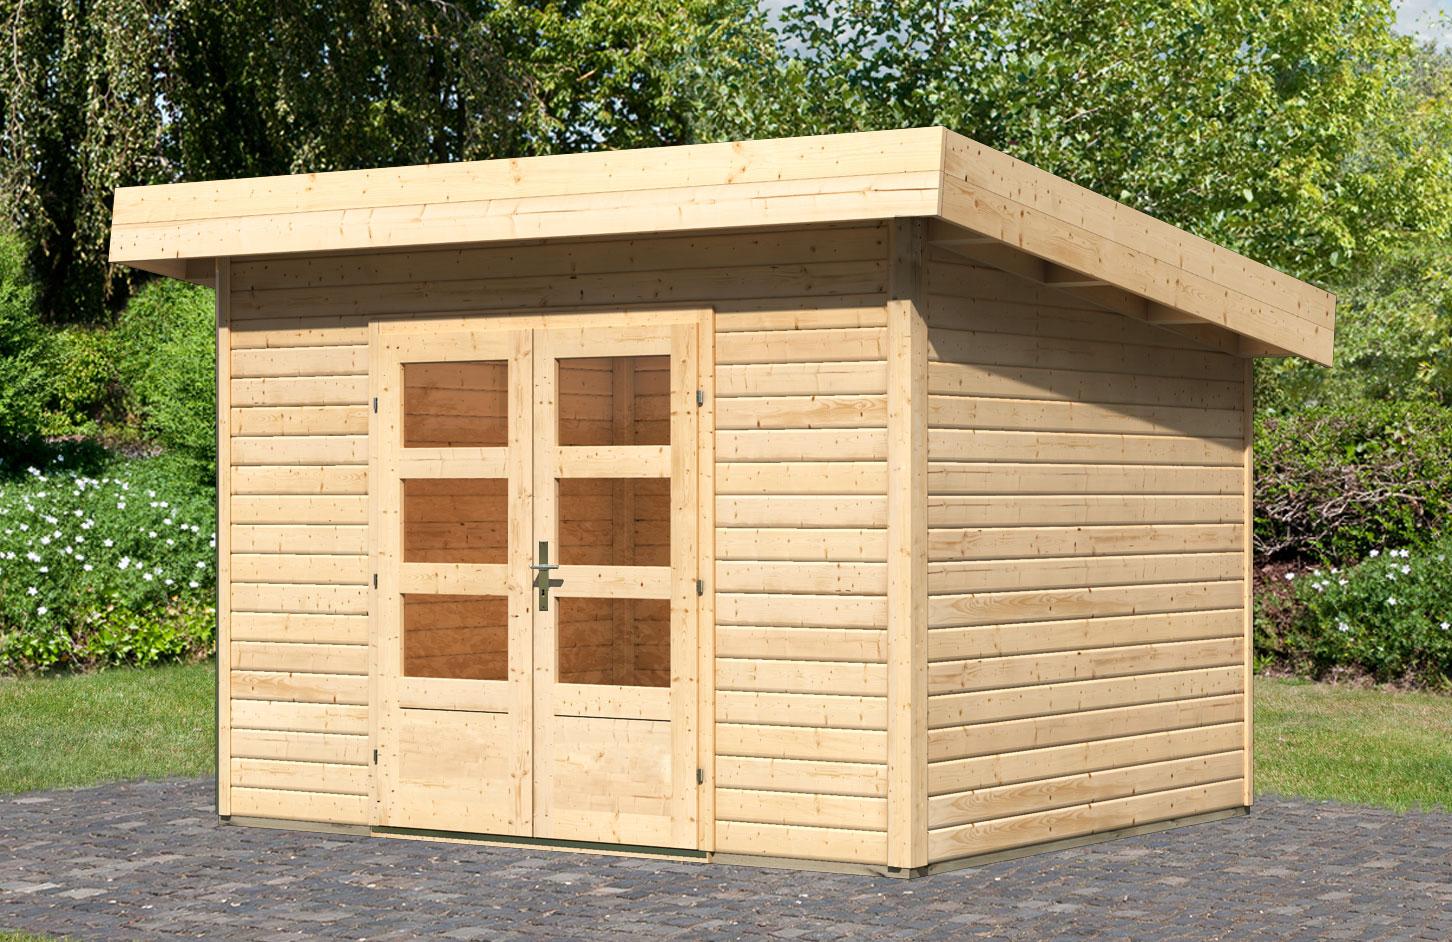 woodfeeling gartenhaus 40 mm northeim 2 natur 358x301cm bei. Black Bedroom Furniture Sets. Home Design Ideas